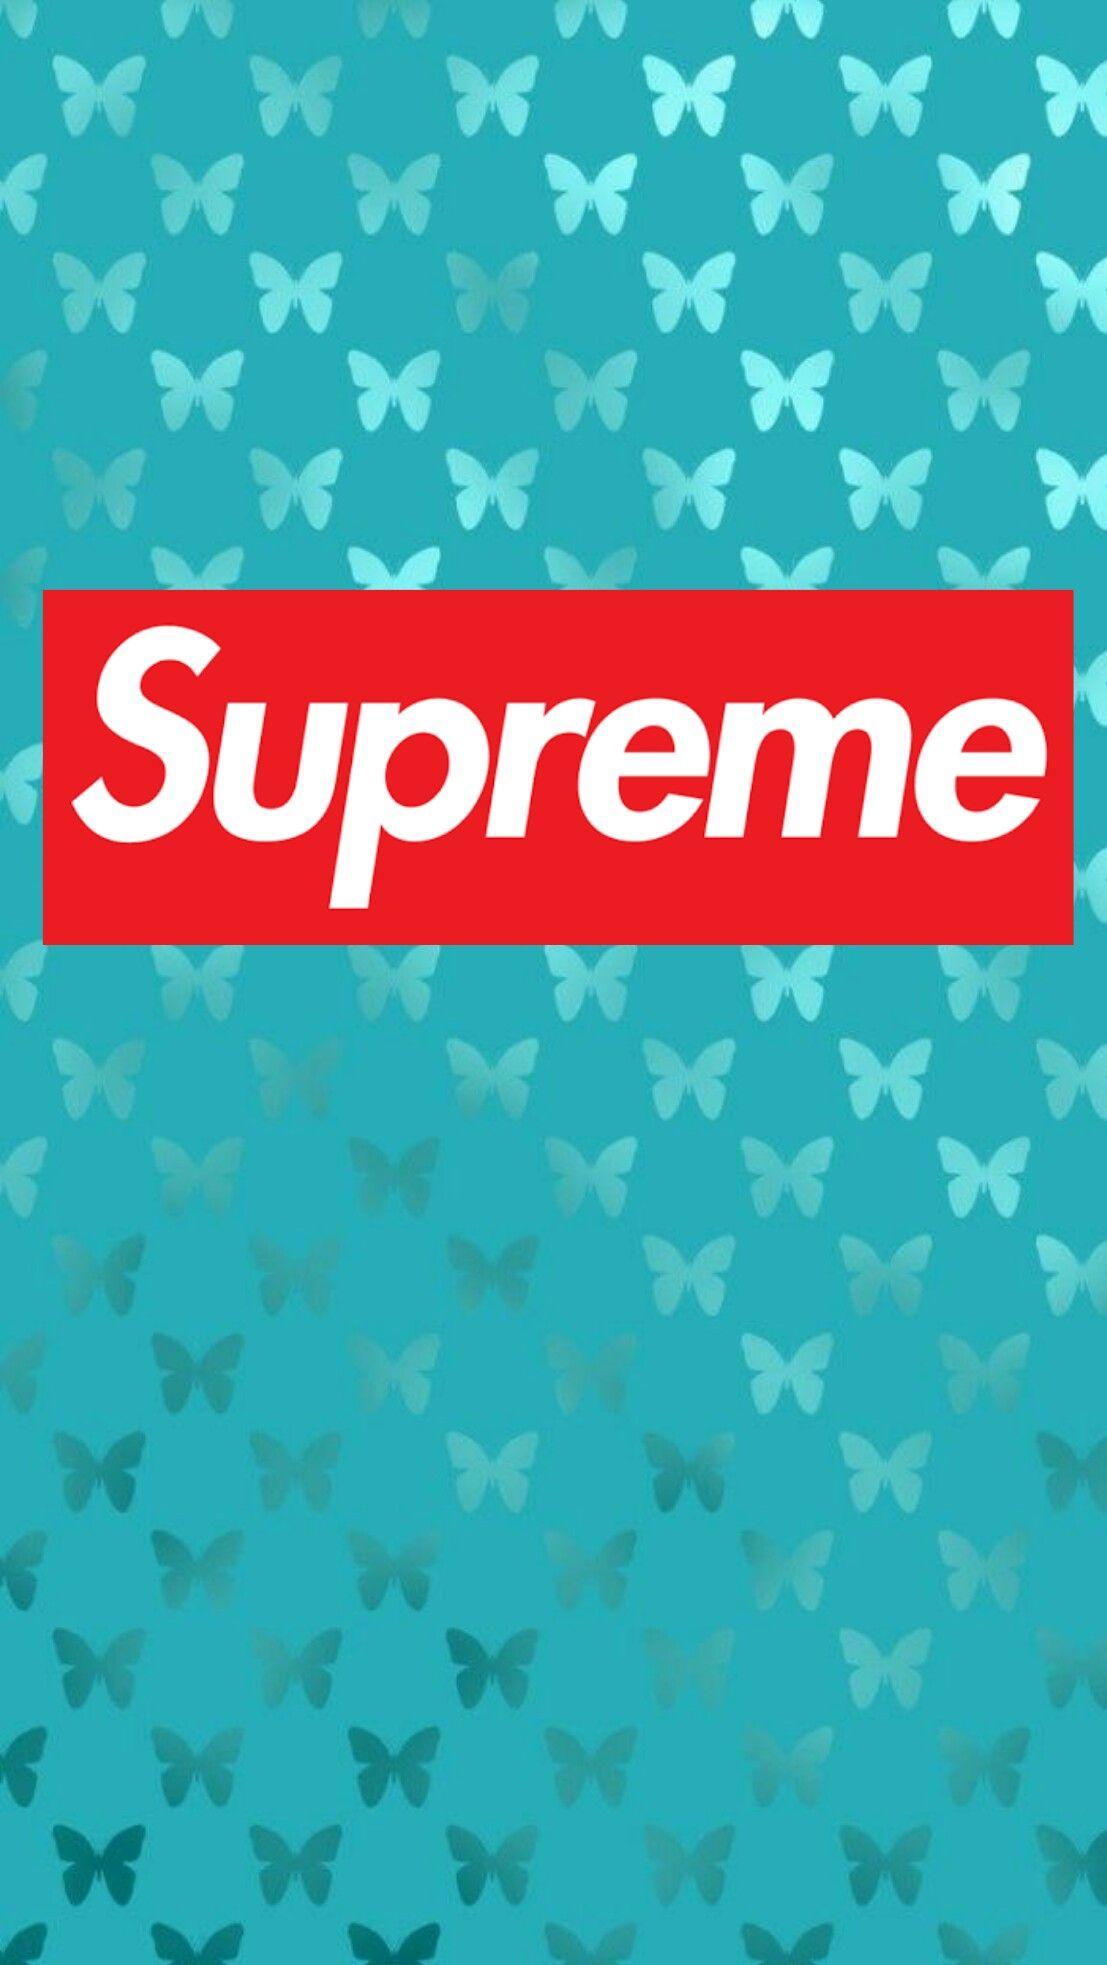 Free Download Supreme Wallpaper 65 Wallpapers 3d Wallpapers